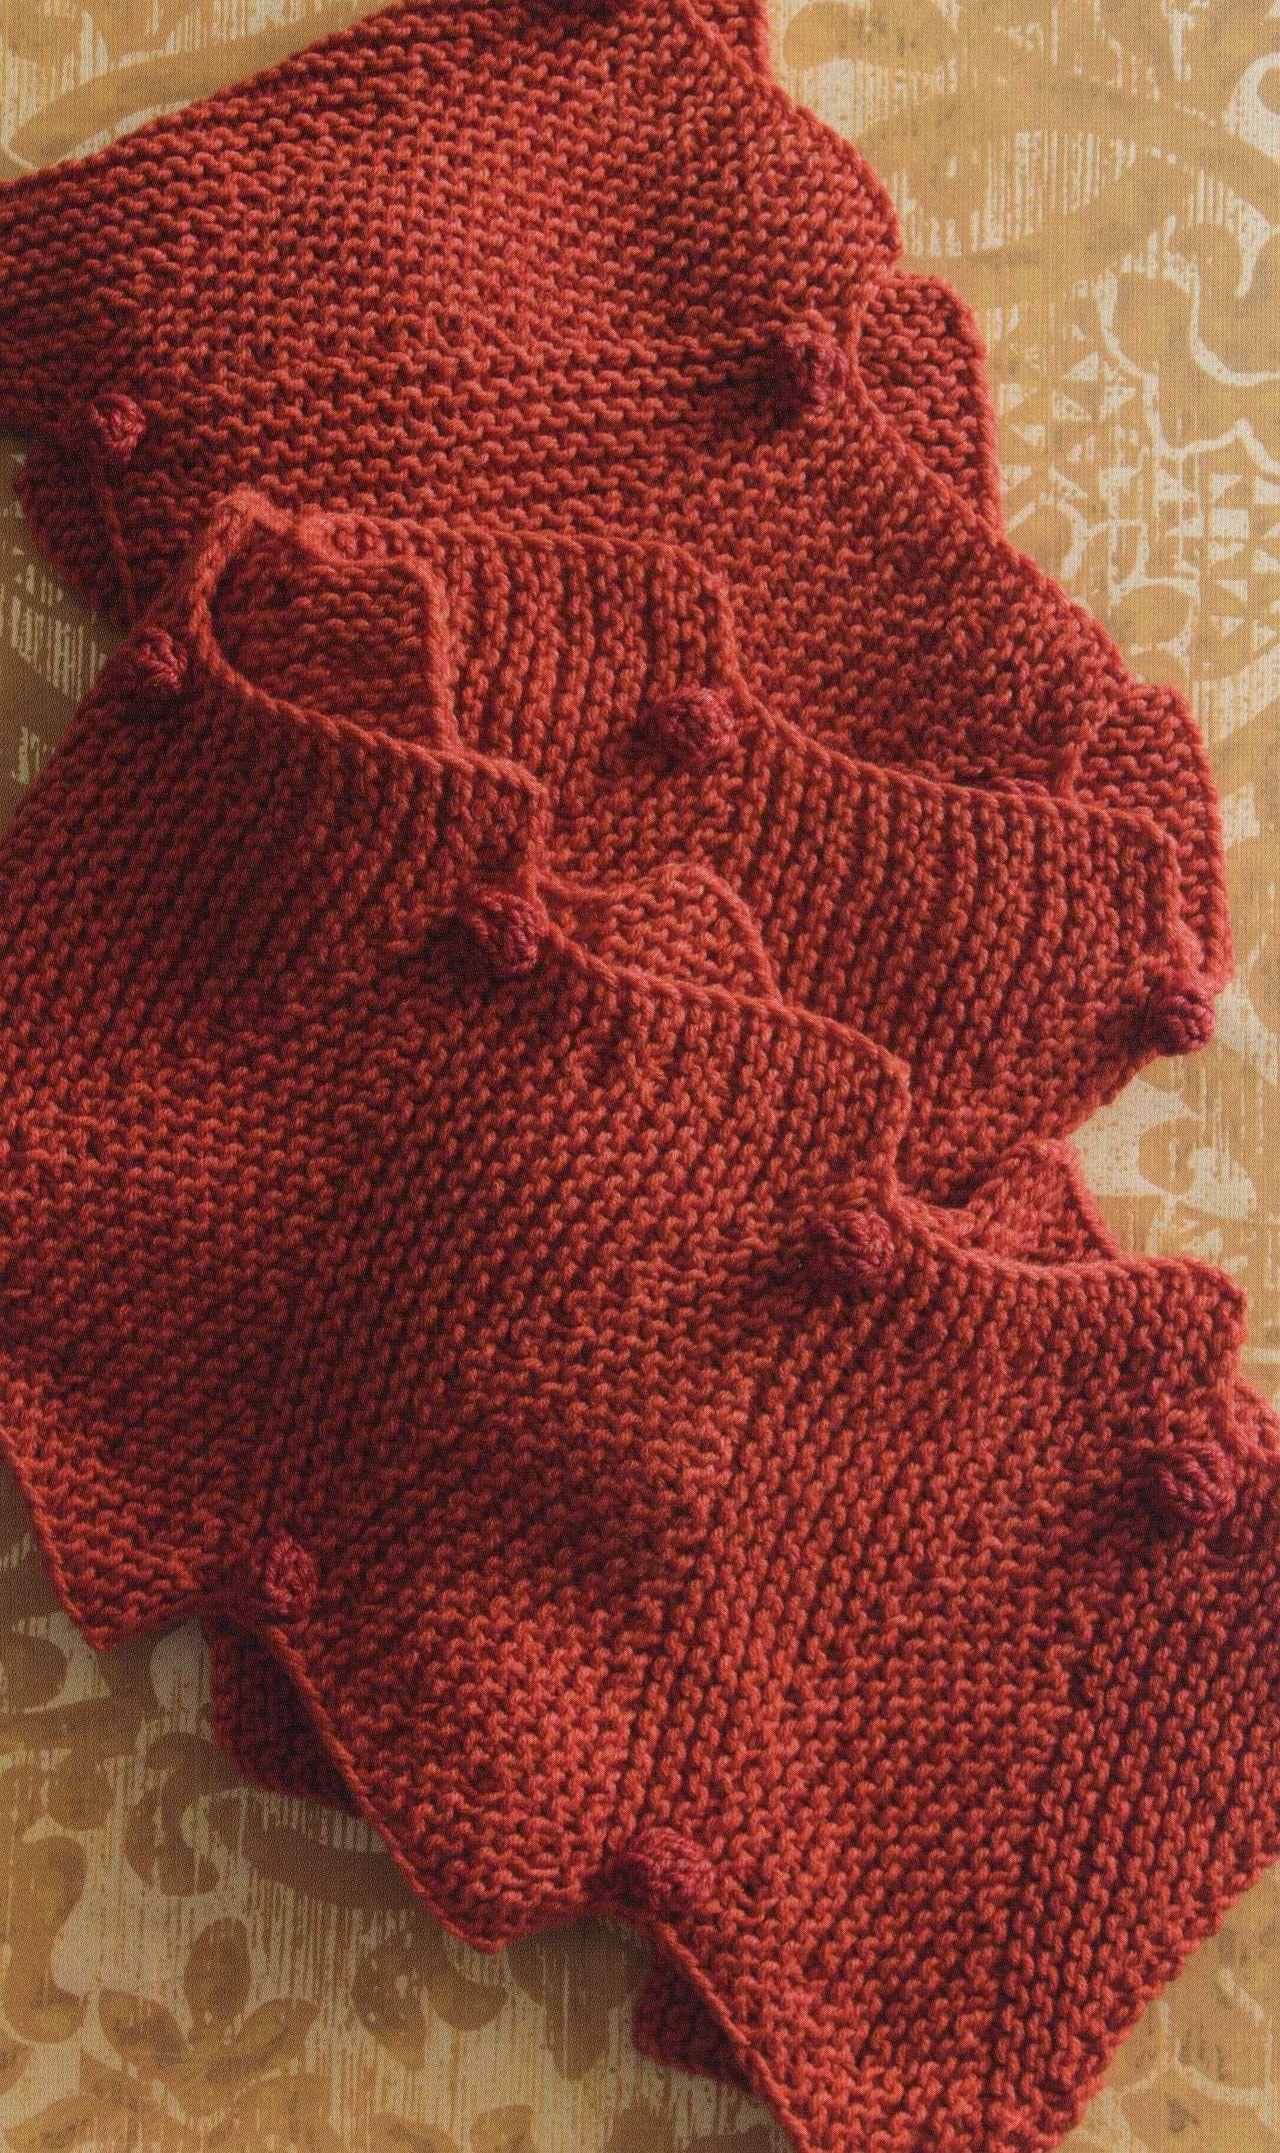 Zig Zag Scarf - Knitting Bee | Mimo | Pinterest | Zig zag, Scarves ...